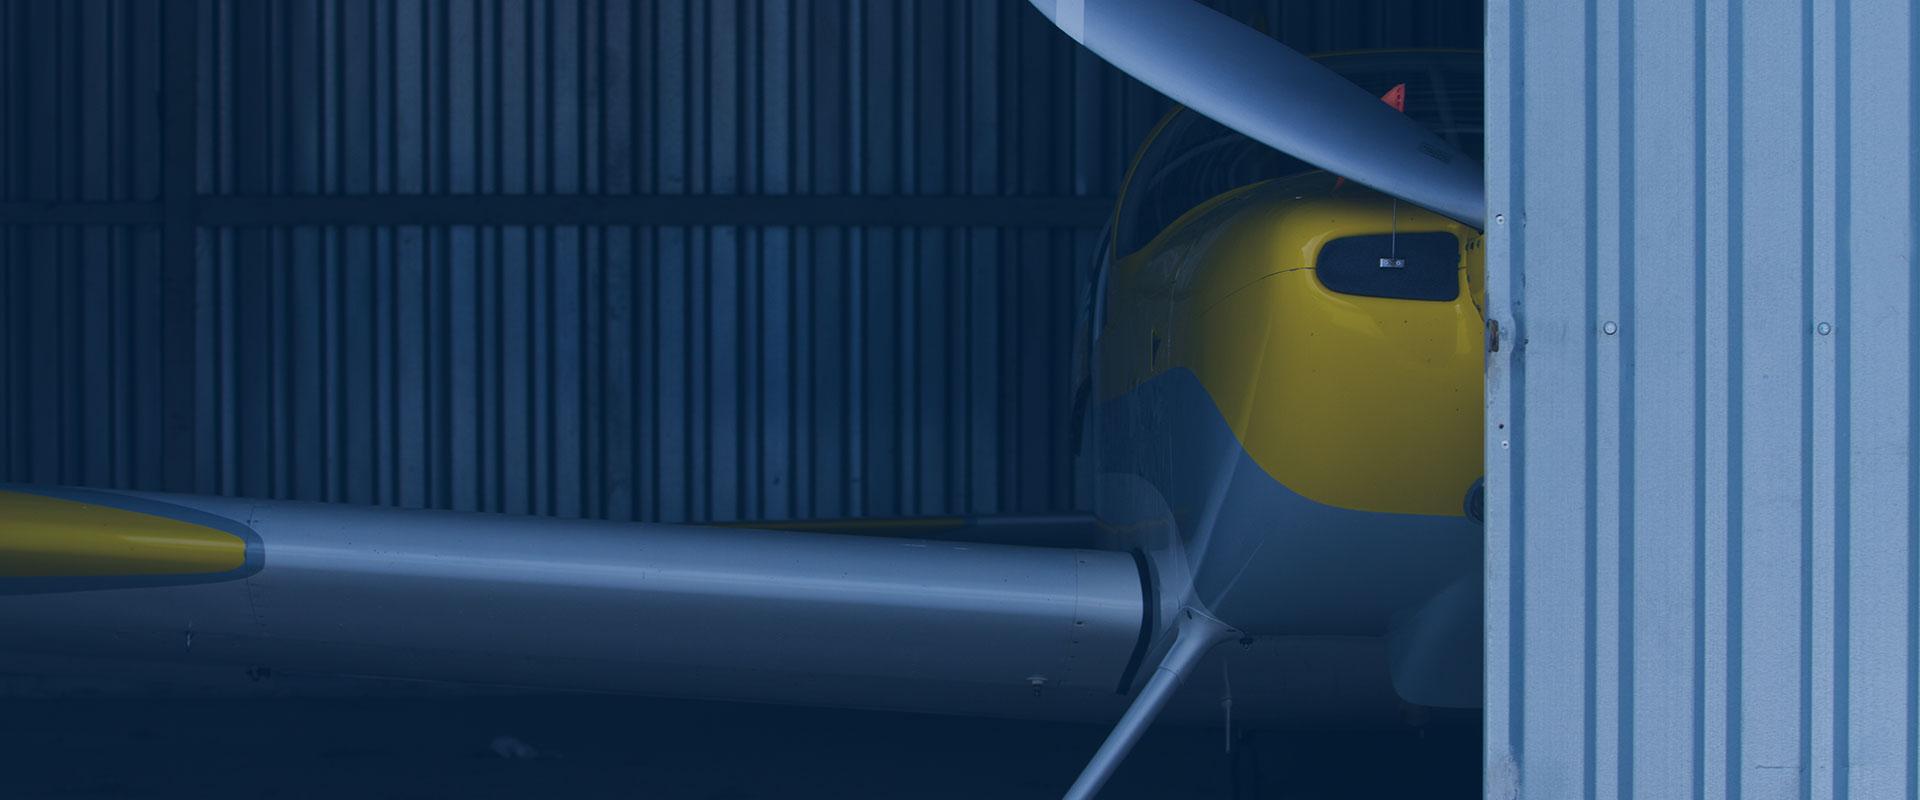 Capa banner-02.jpg - Seguro de Resp. Civil Hangares